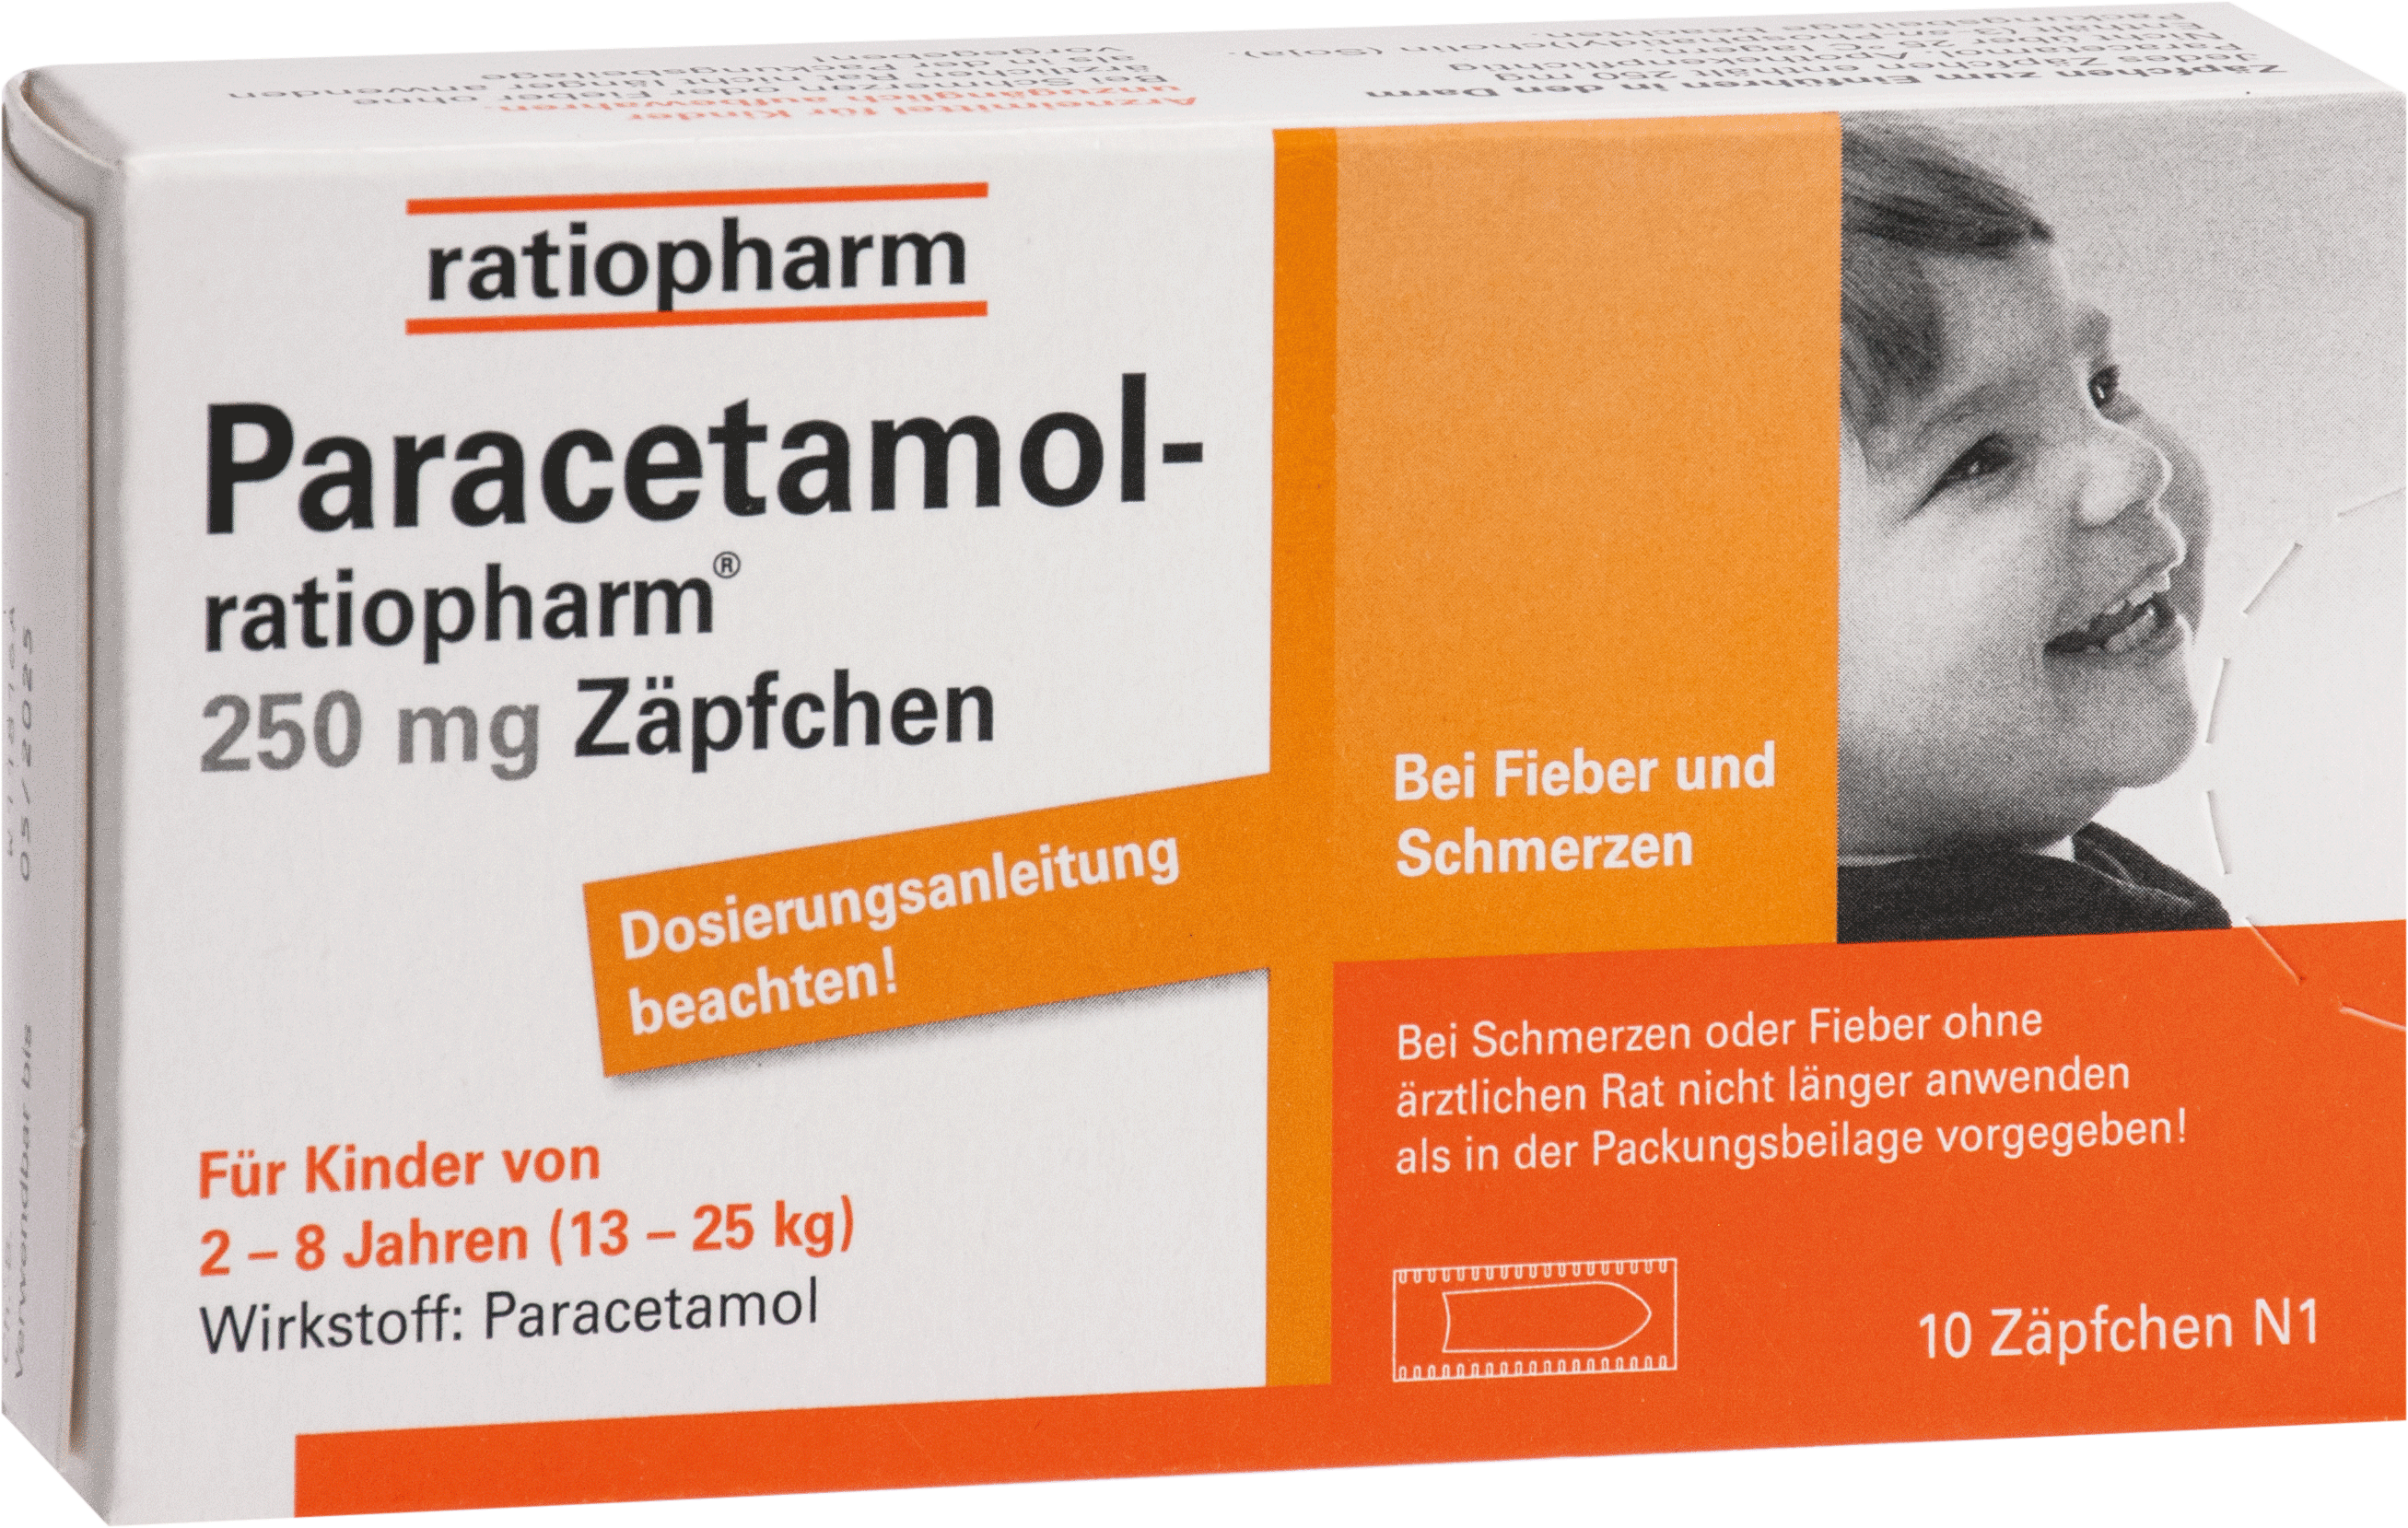 Paracetamol-ratiopharm 250mg Zäpfchen